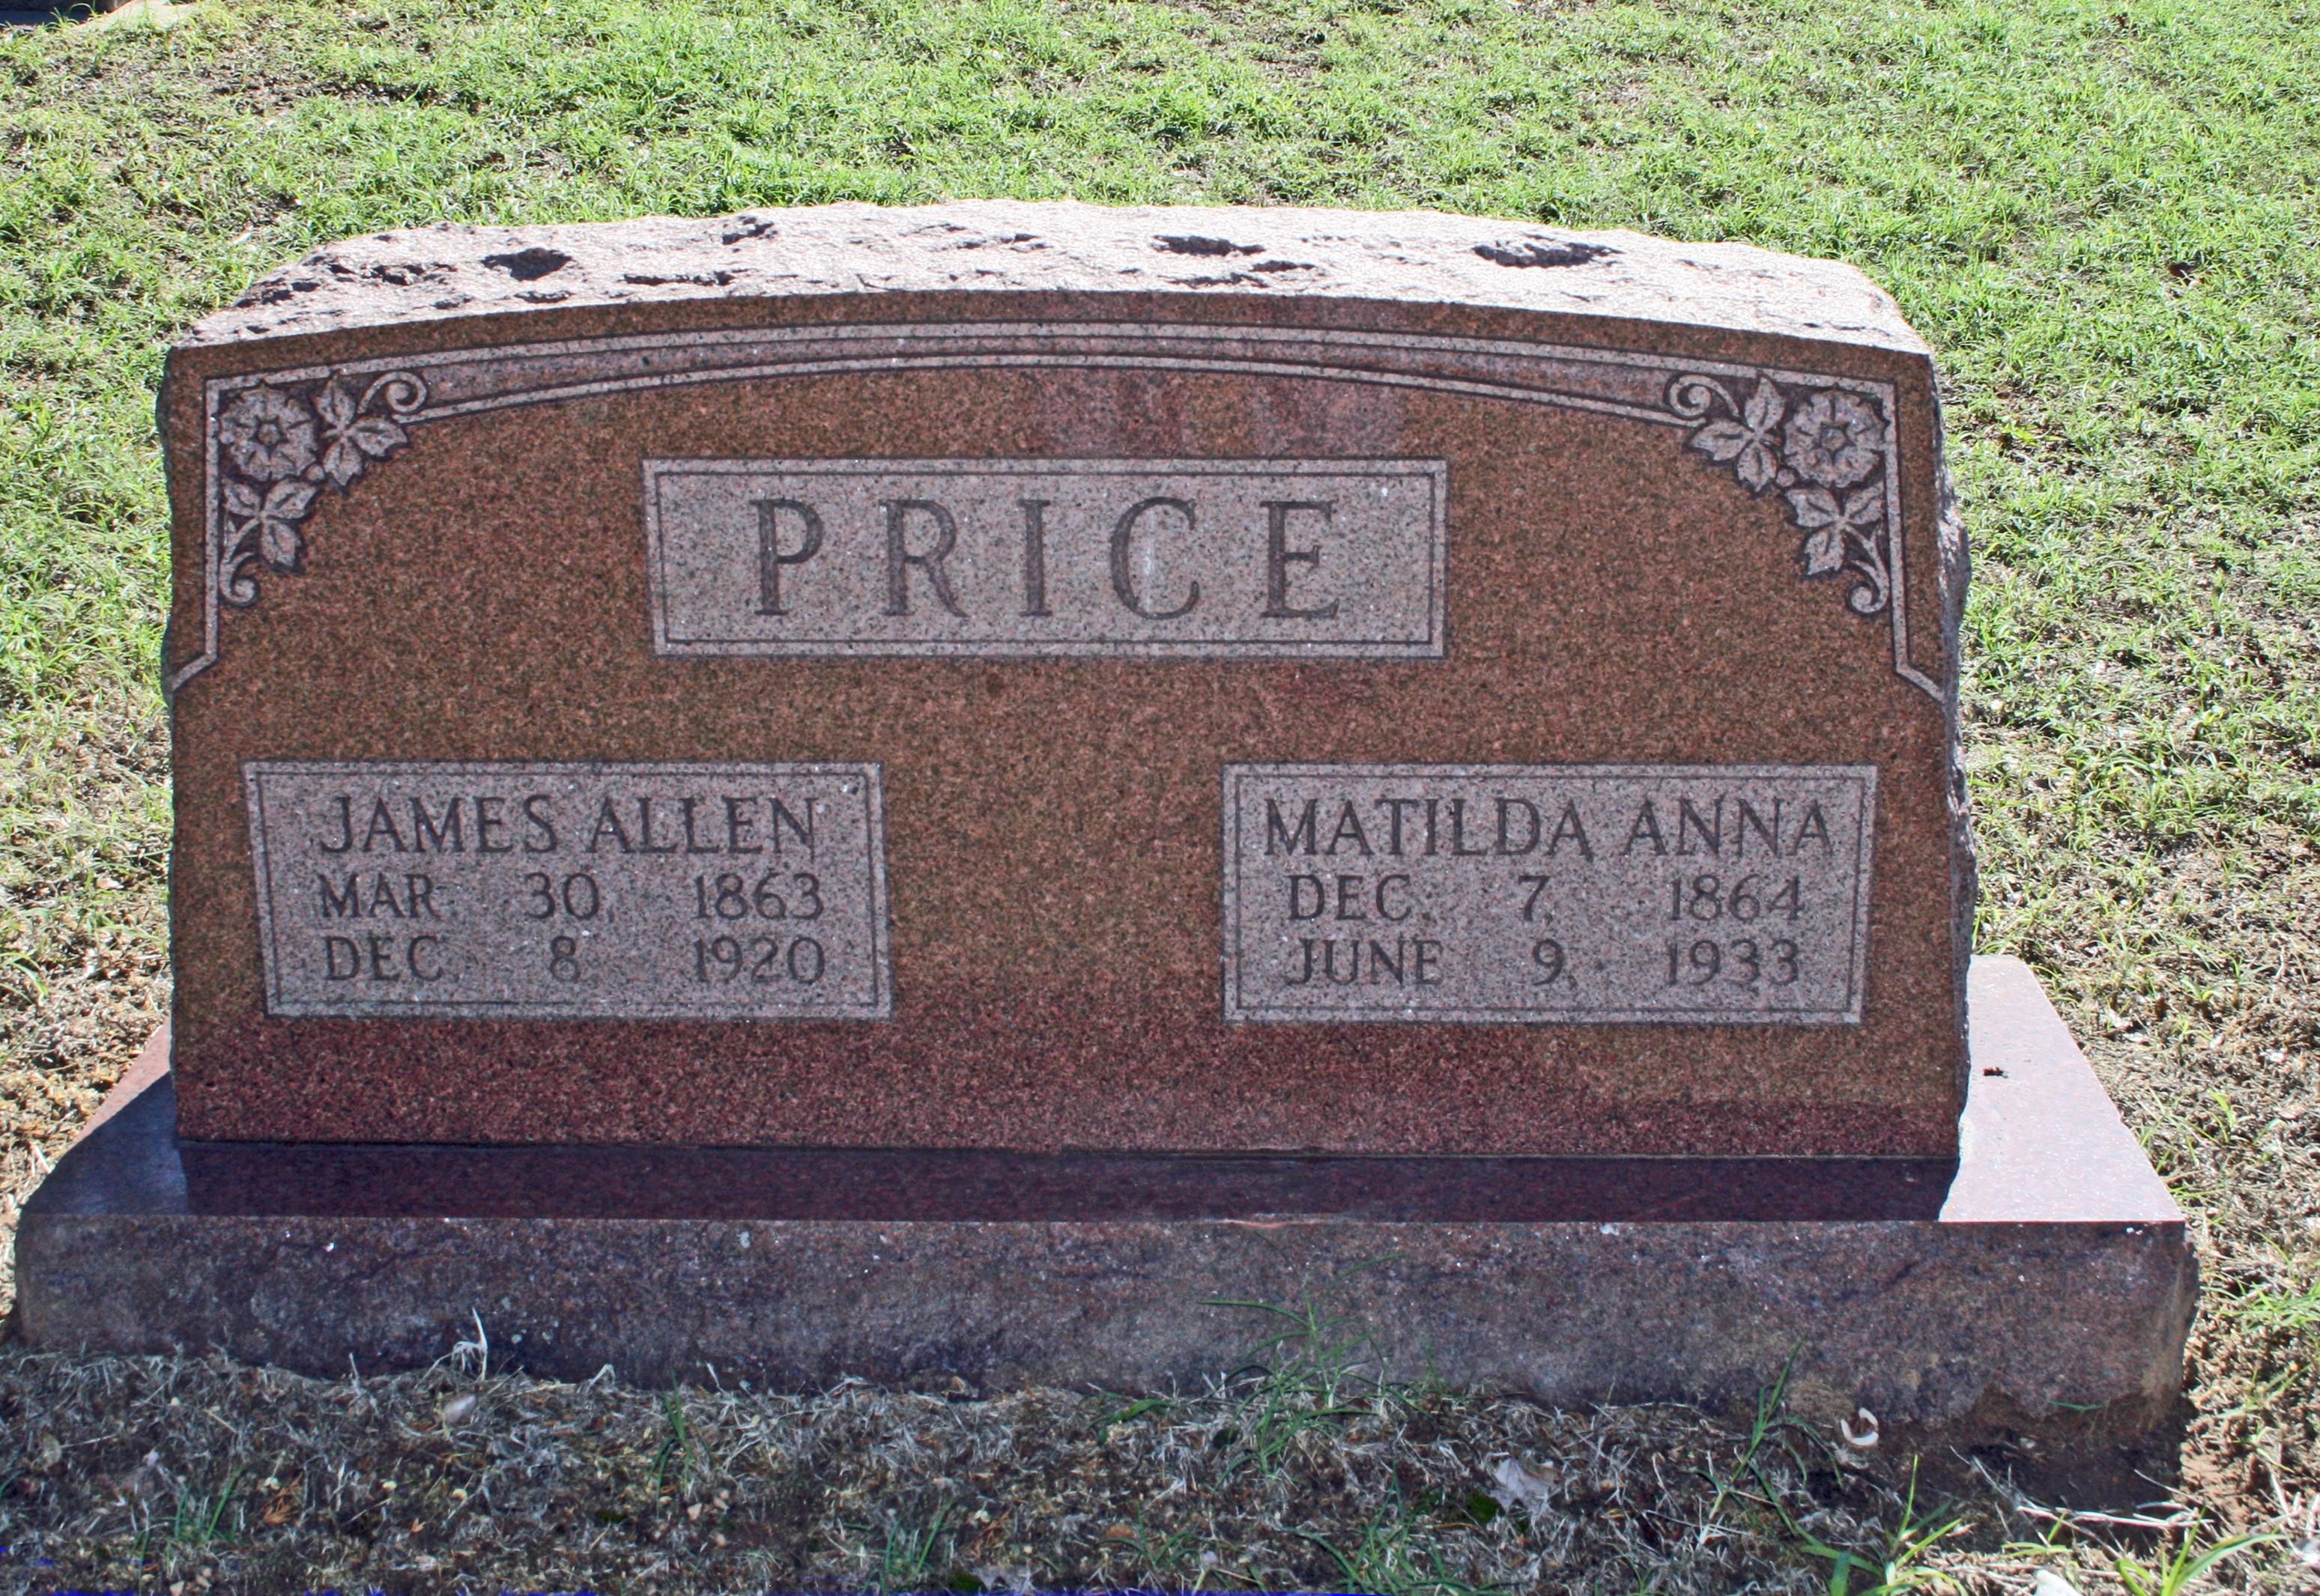 James Allen Price